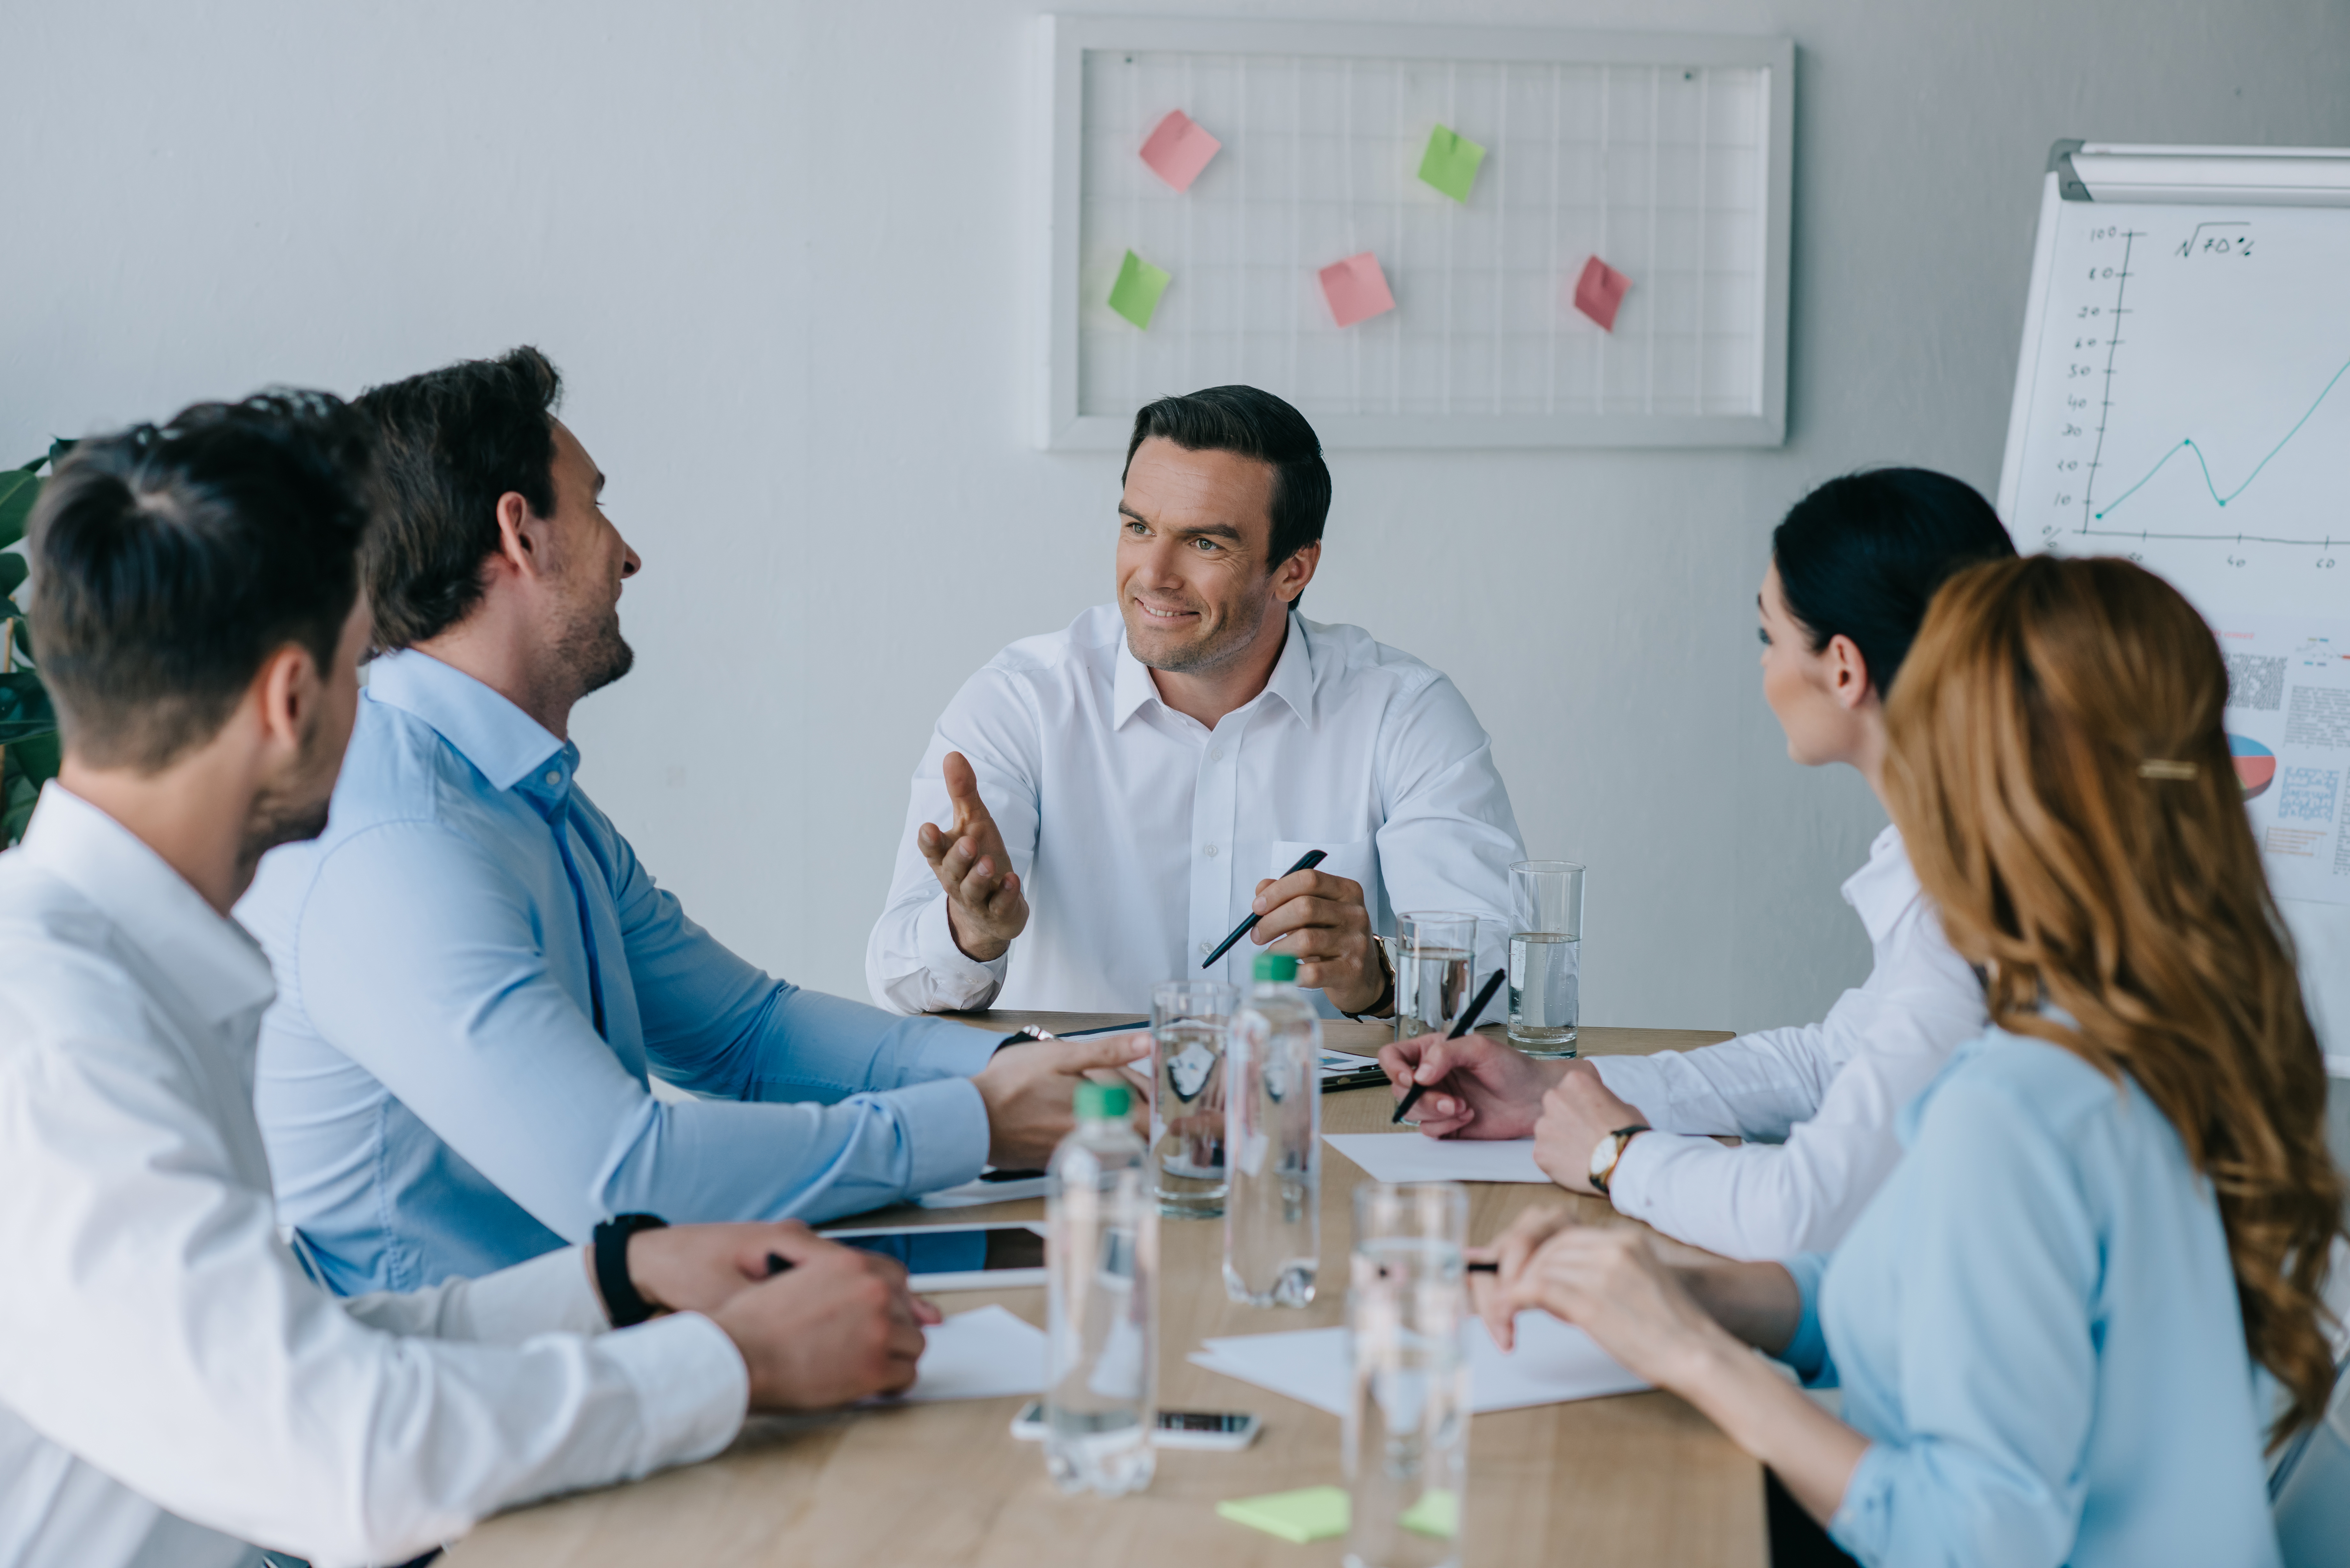 Executive Team Building Archives - Simon Vetter